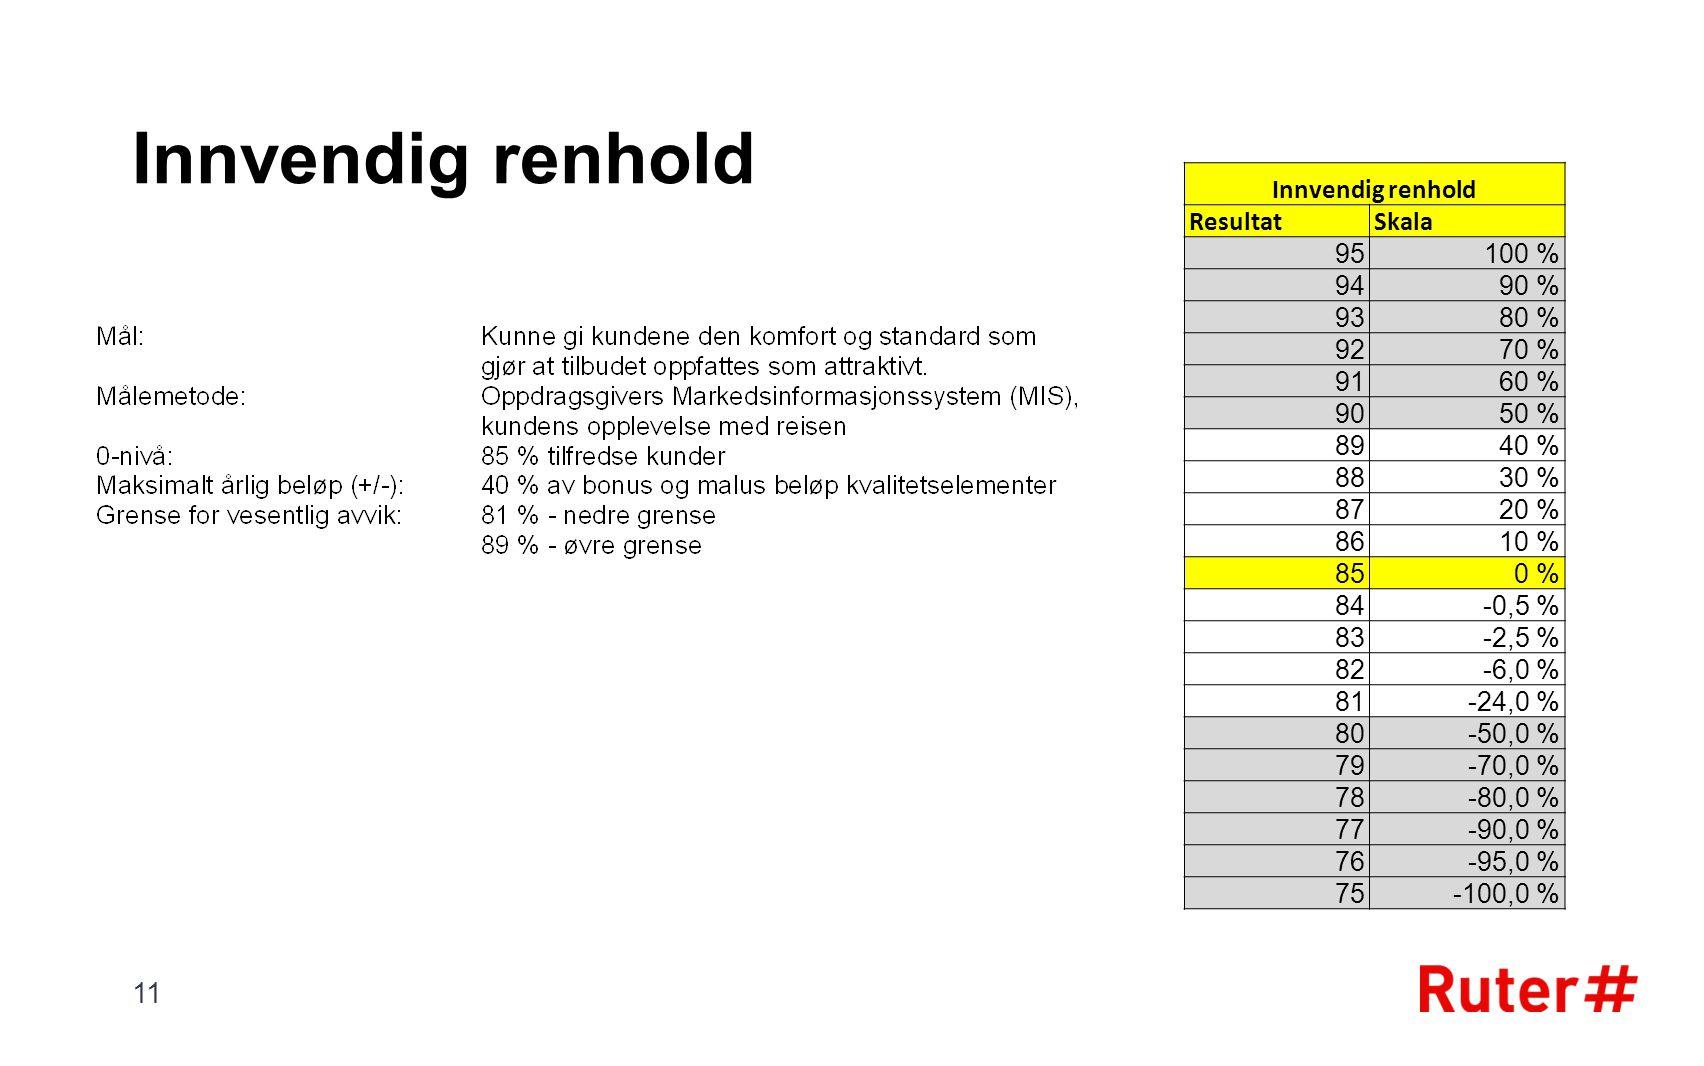 Innvendig renhold ResultatSkala 95100 % 9490 % 9380 % 9270 % 9160 % 9050 % 8940 % 8830 % 8720 % 8610 % 850 % 84-0,5 % 83-2,5 % 82-6,0 % 81-24,0 % 80-50,0 % 79-70,0 % 78-80,0 % 77-90,0 % 76-95,0 % 75-100,0 % 11